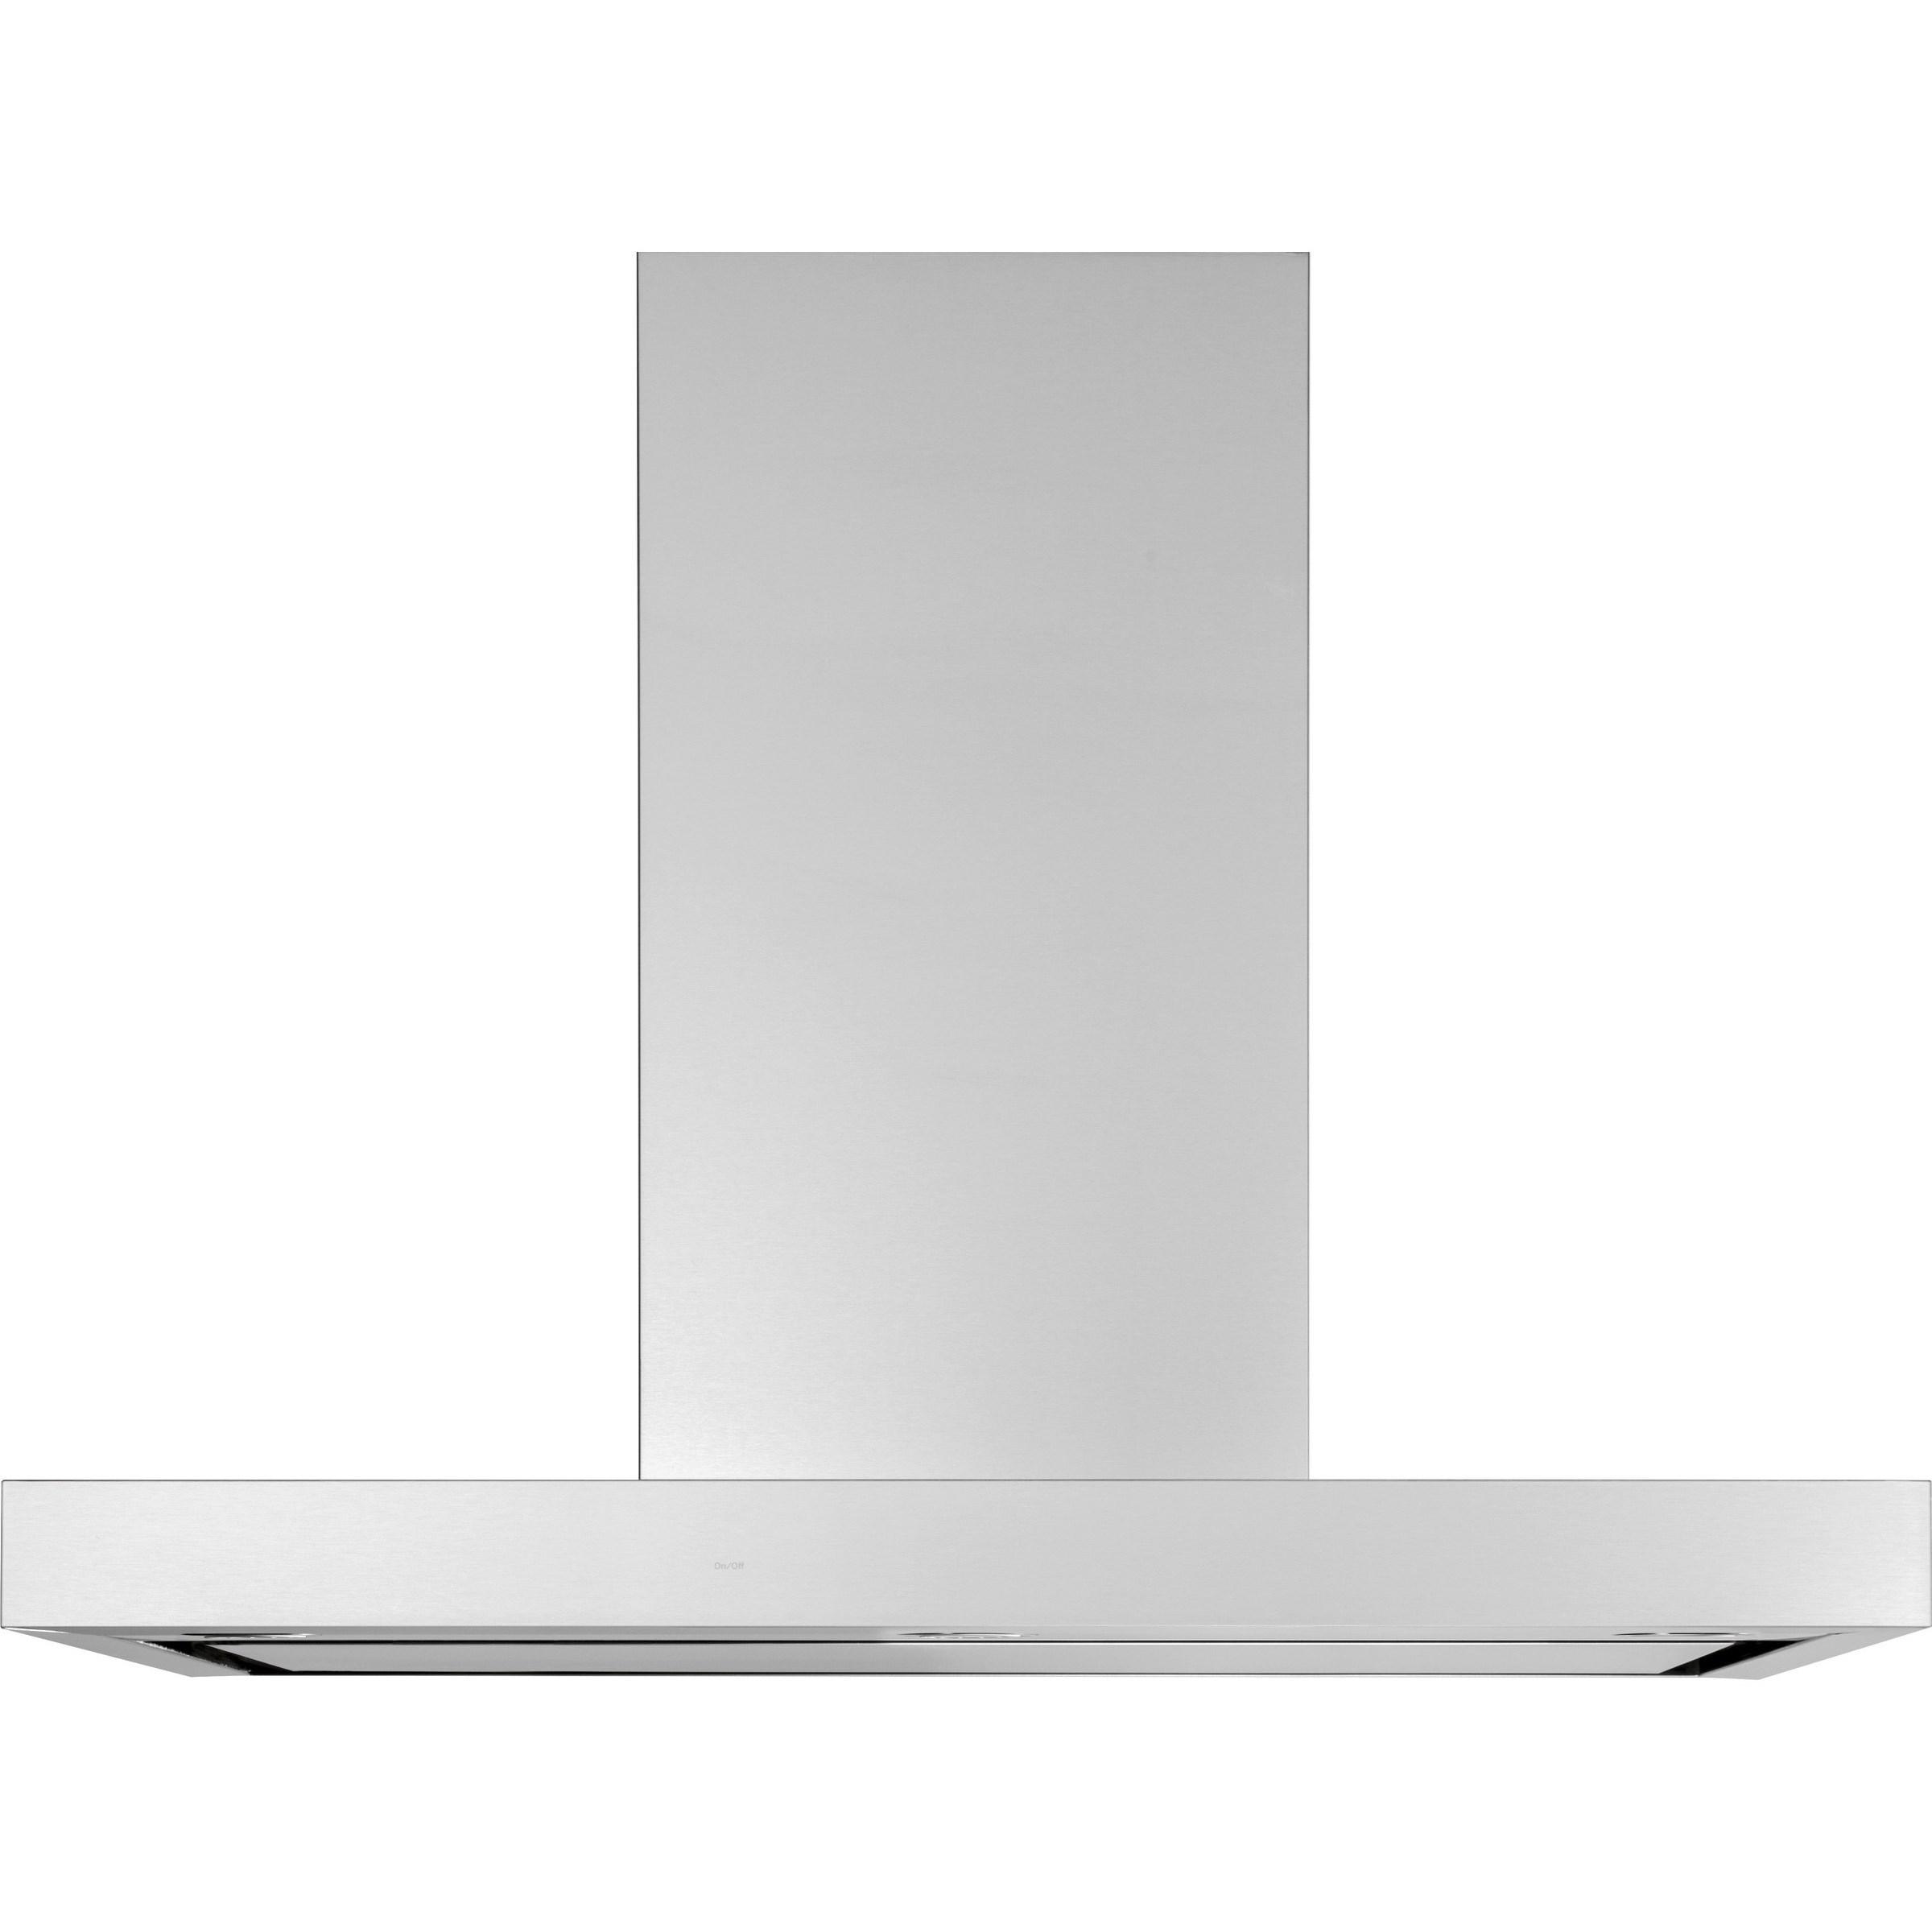 "Ventilation Hoods 36"" Smart Designer Wall Mount Hood by GE Appliances at VanDrie Home Furnishings"